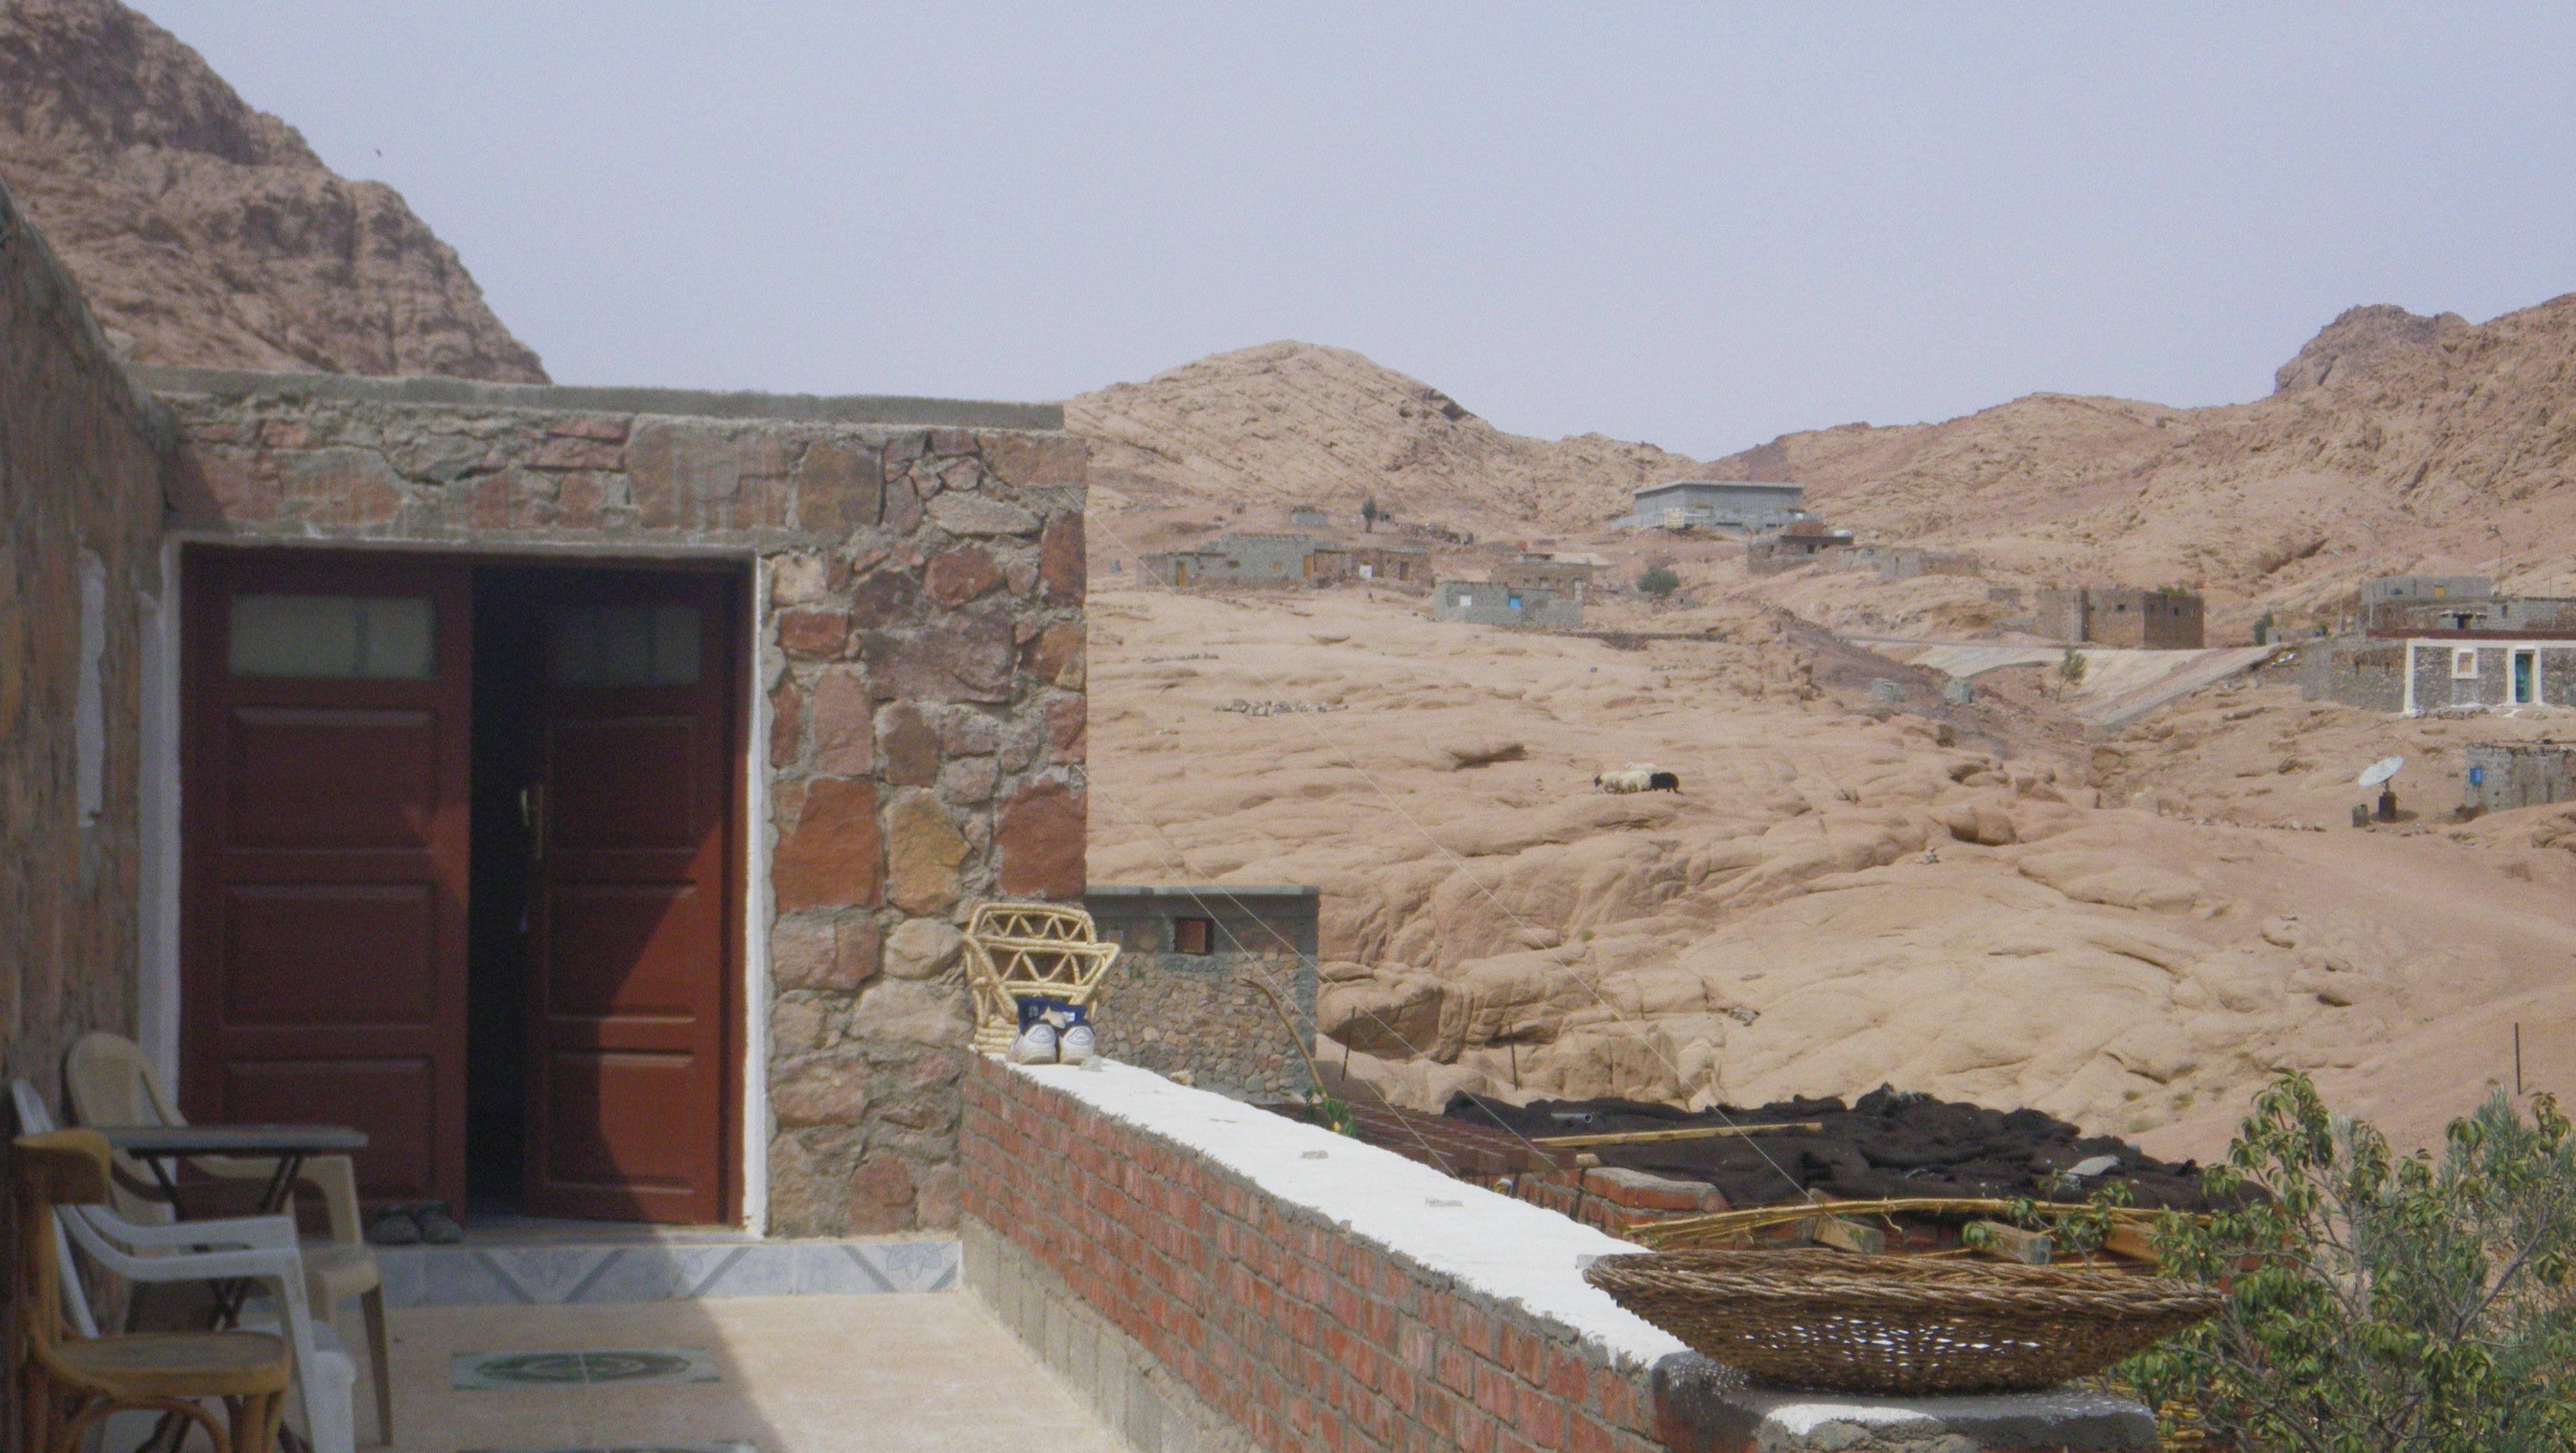 El Milga Beduin Camp